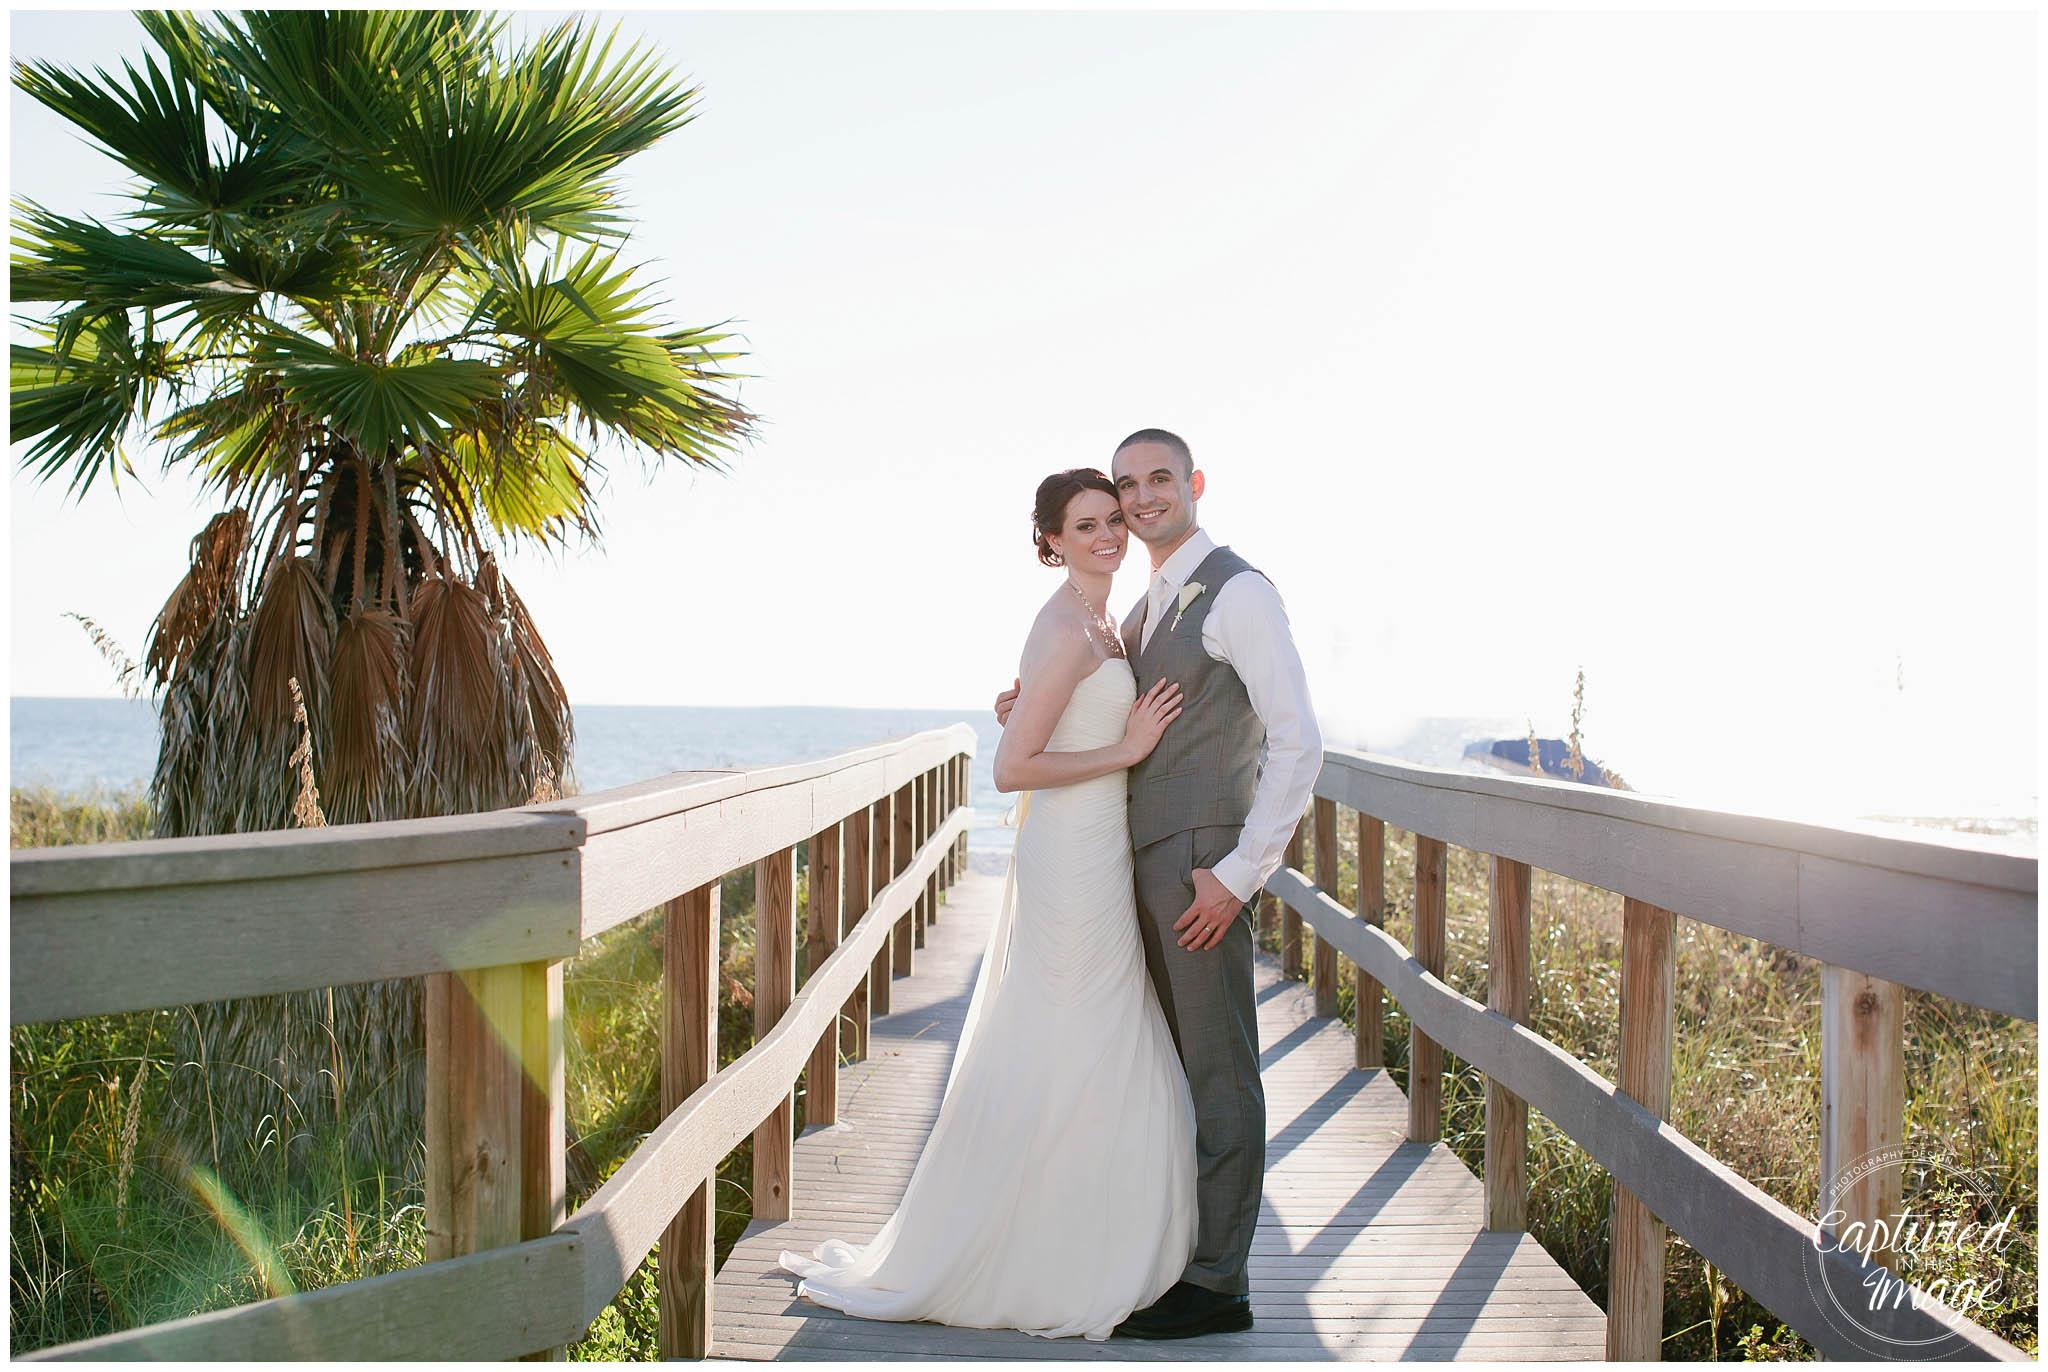 St. Pete Beach Destination Wedding (32 of 81)